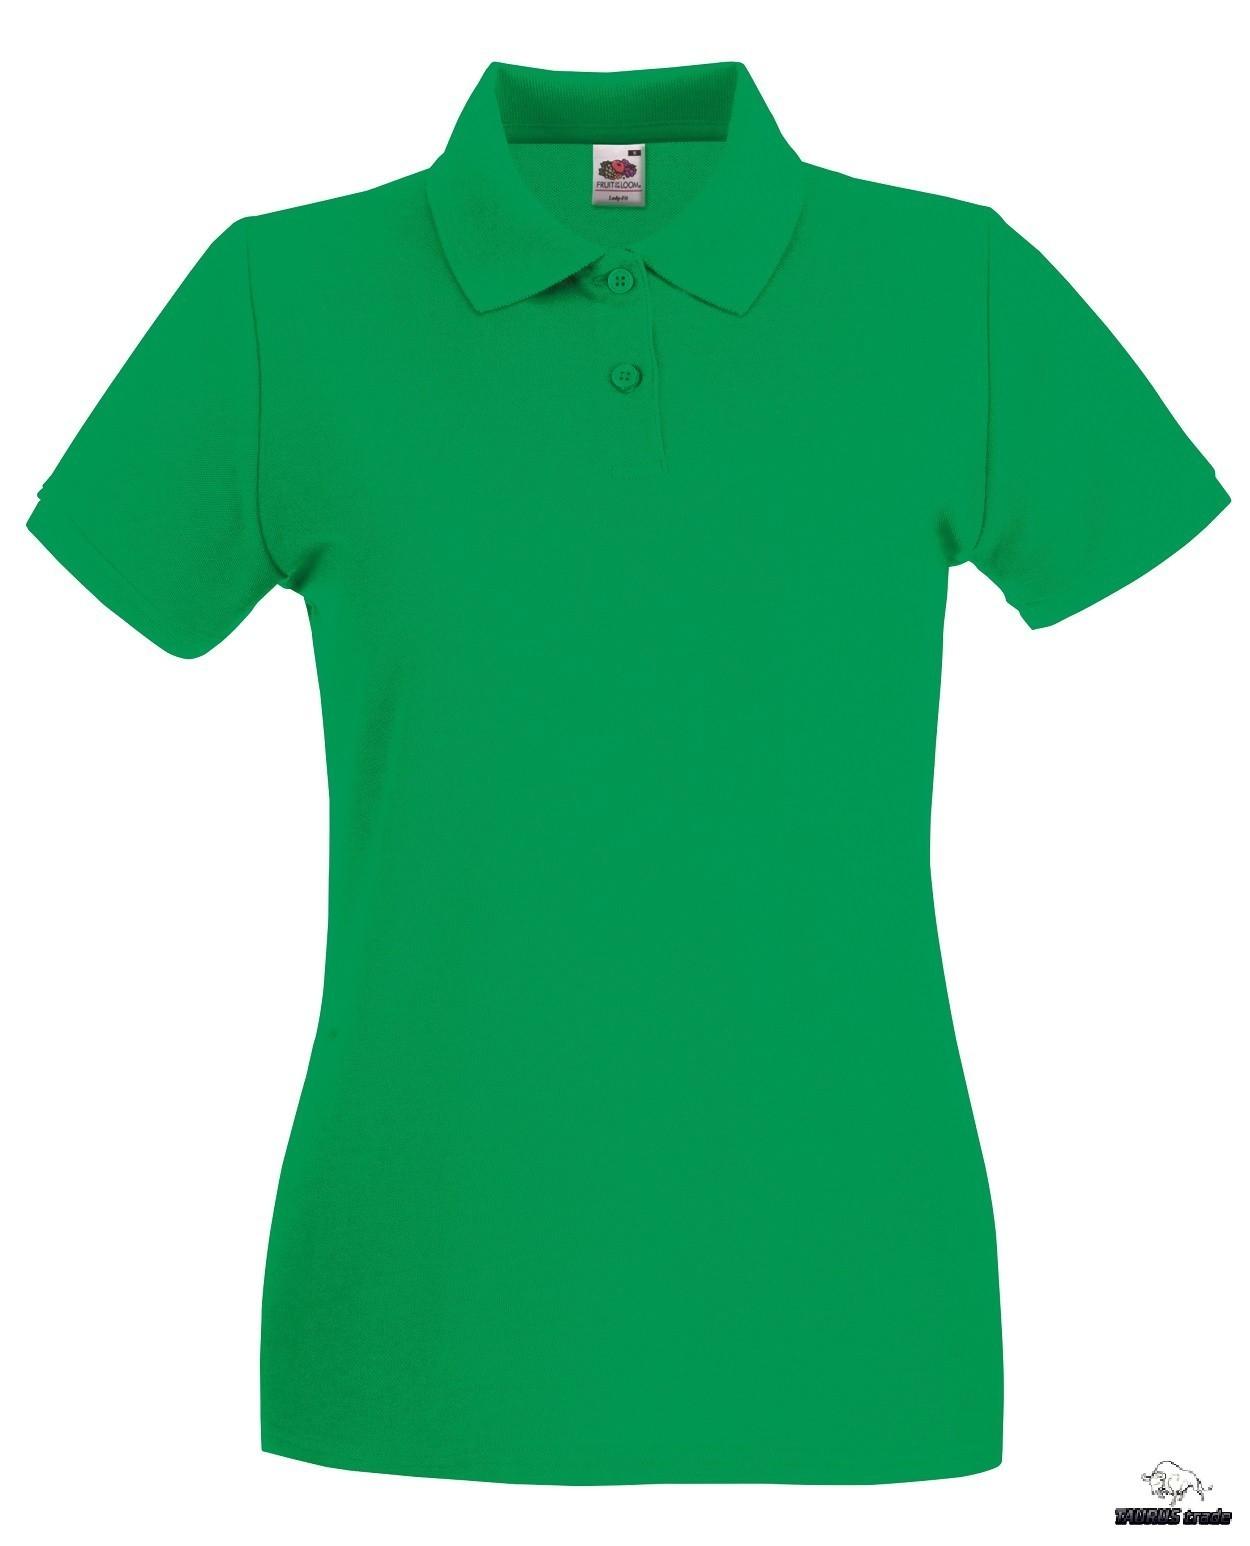 63-030-kelly green